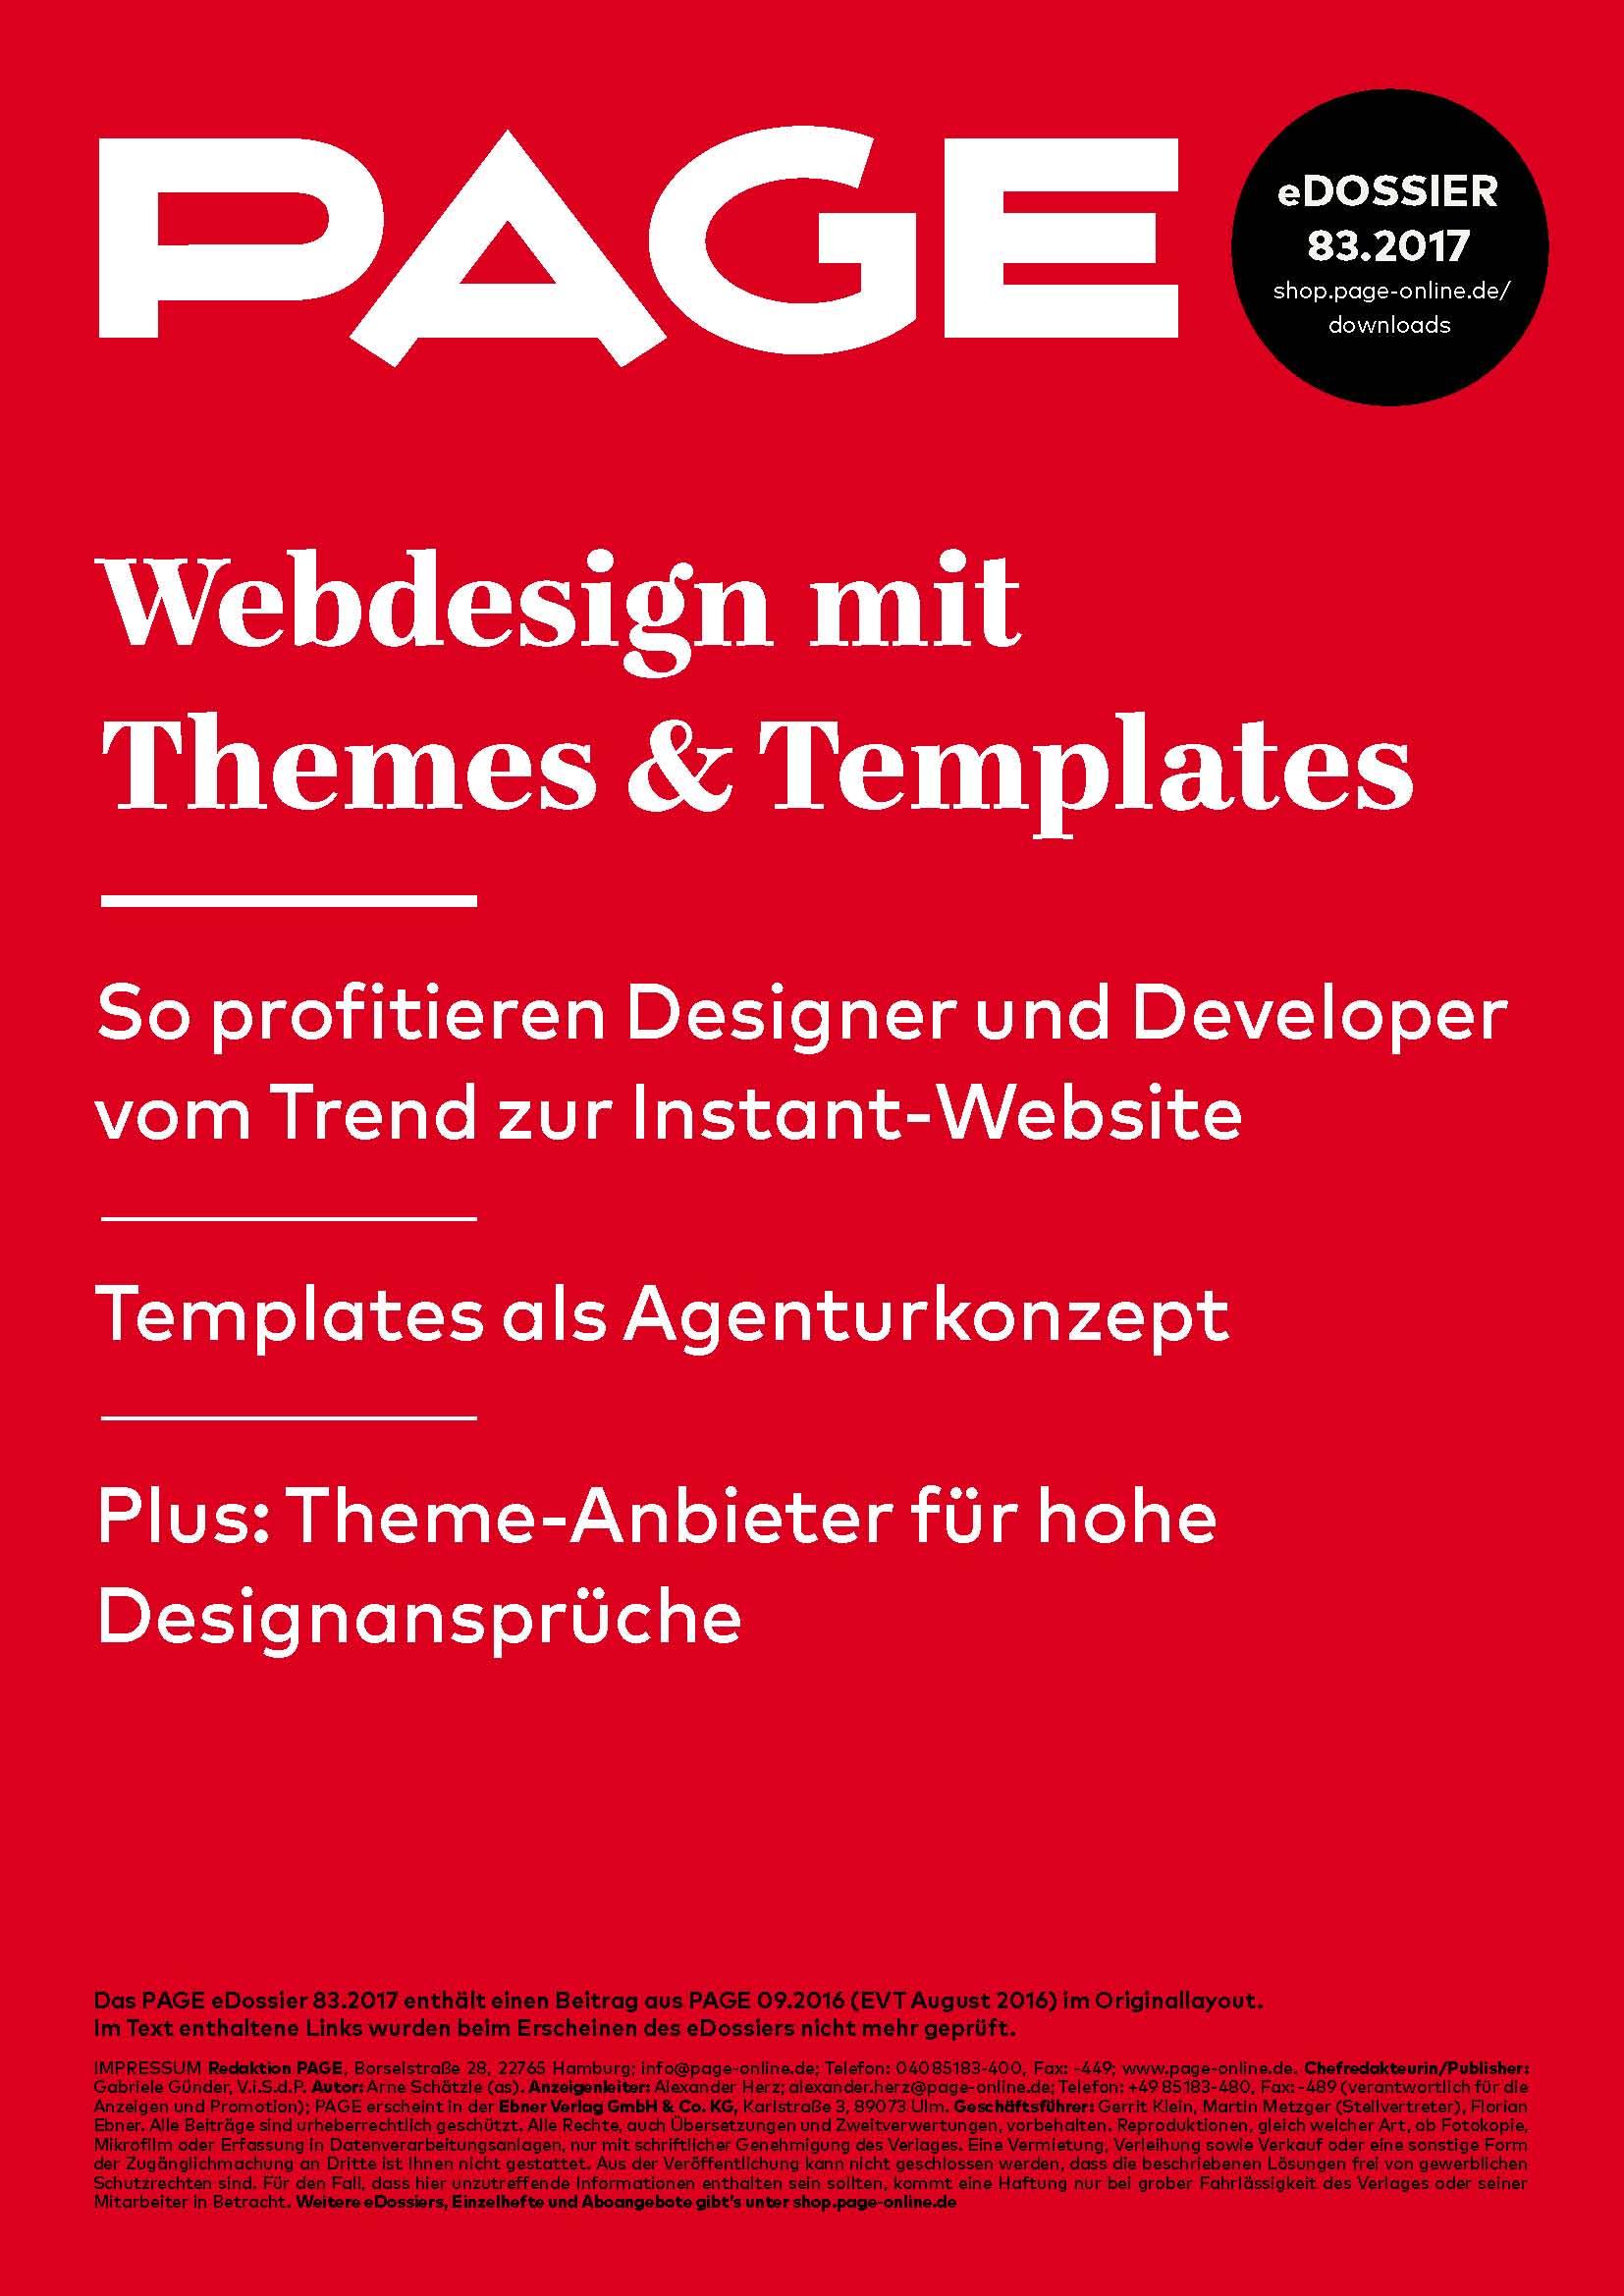 WordPress, WordPress Themes, Support, Themeforest, Service, Webdesign, Template, Code, Shopify, Webdesigner, Entwickler, Programmierung